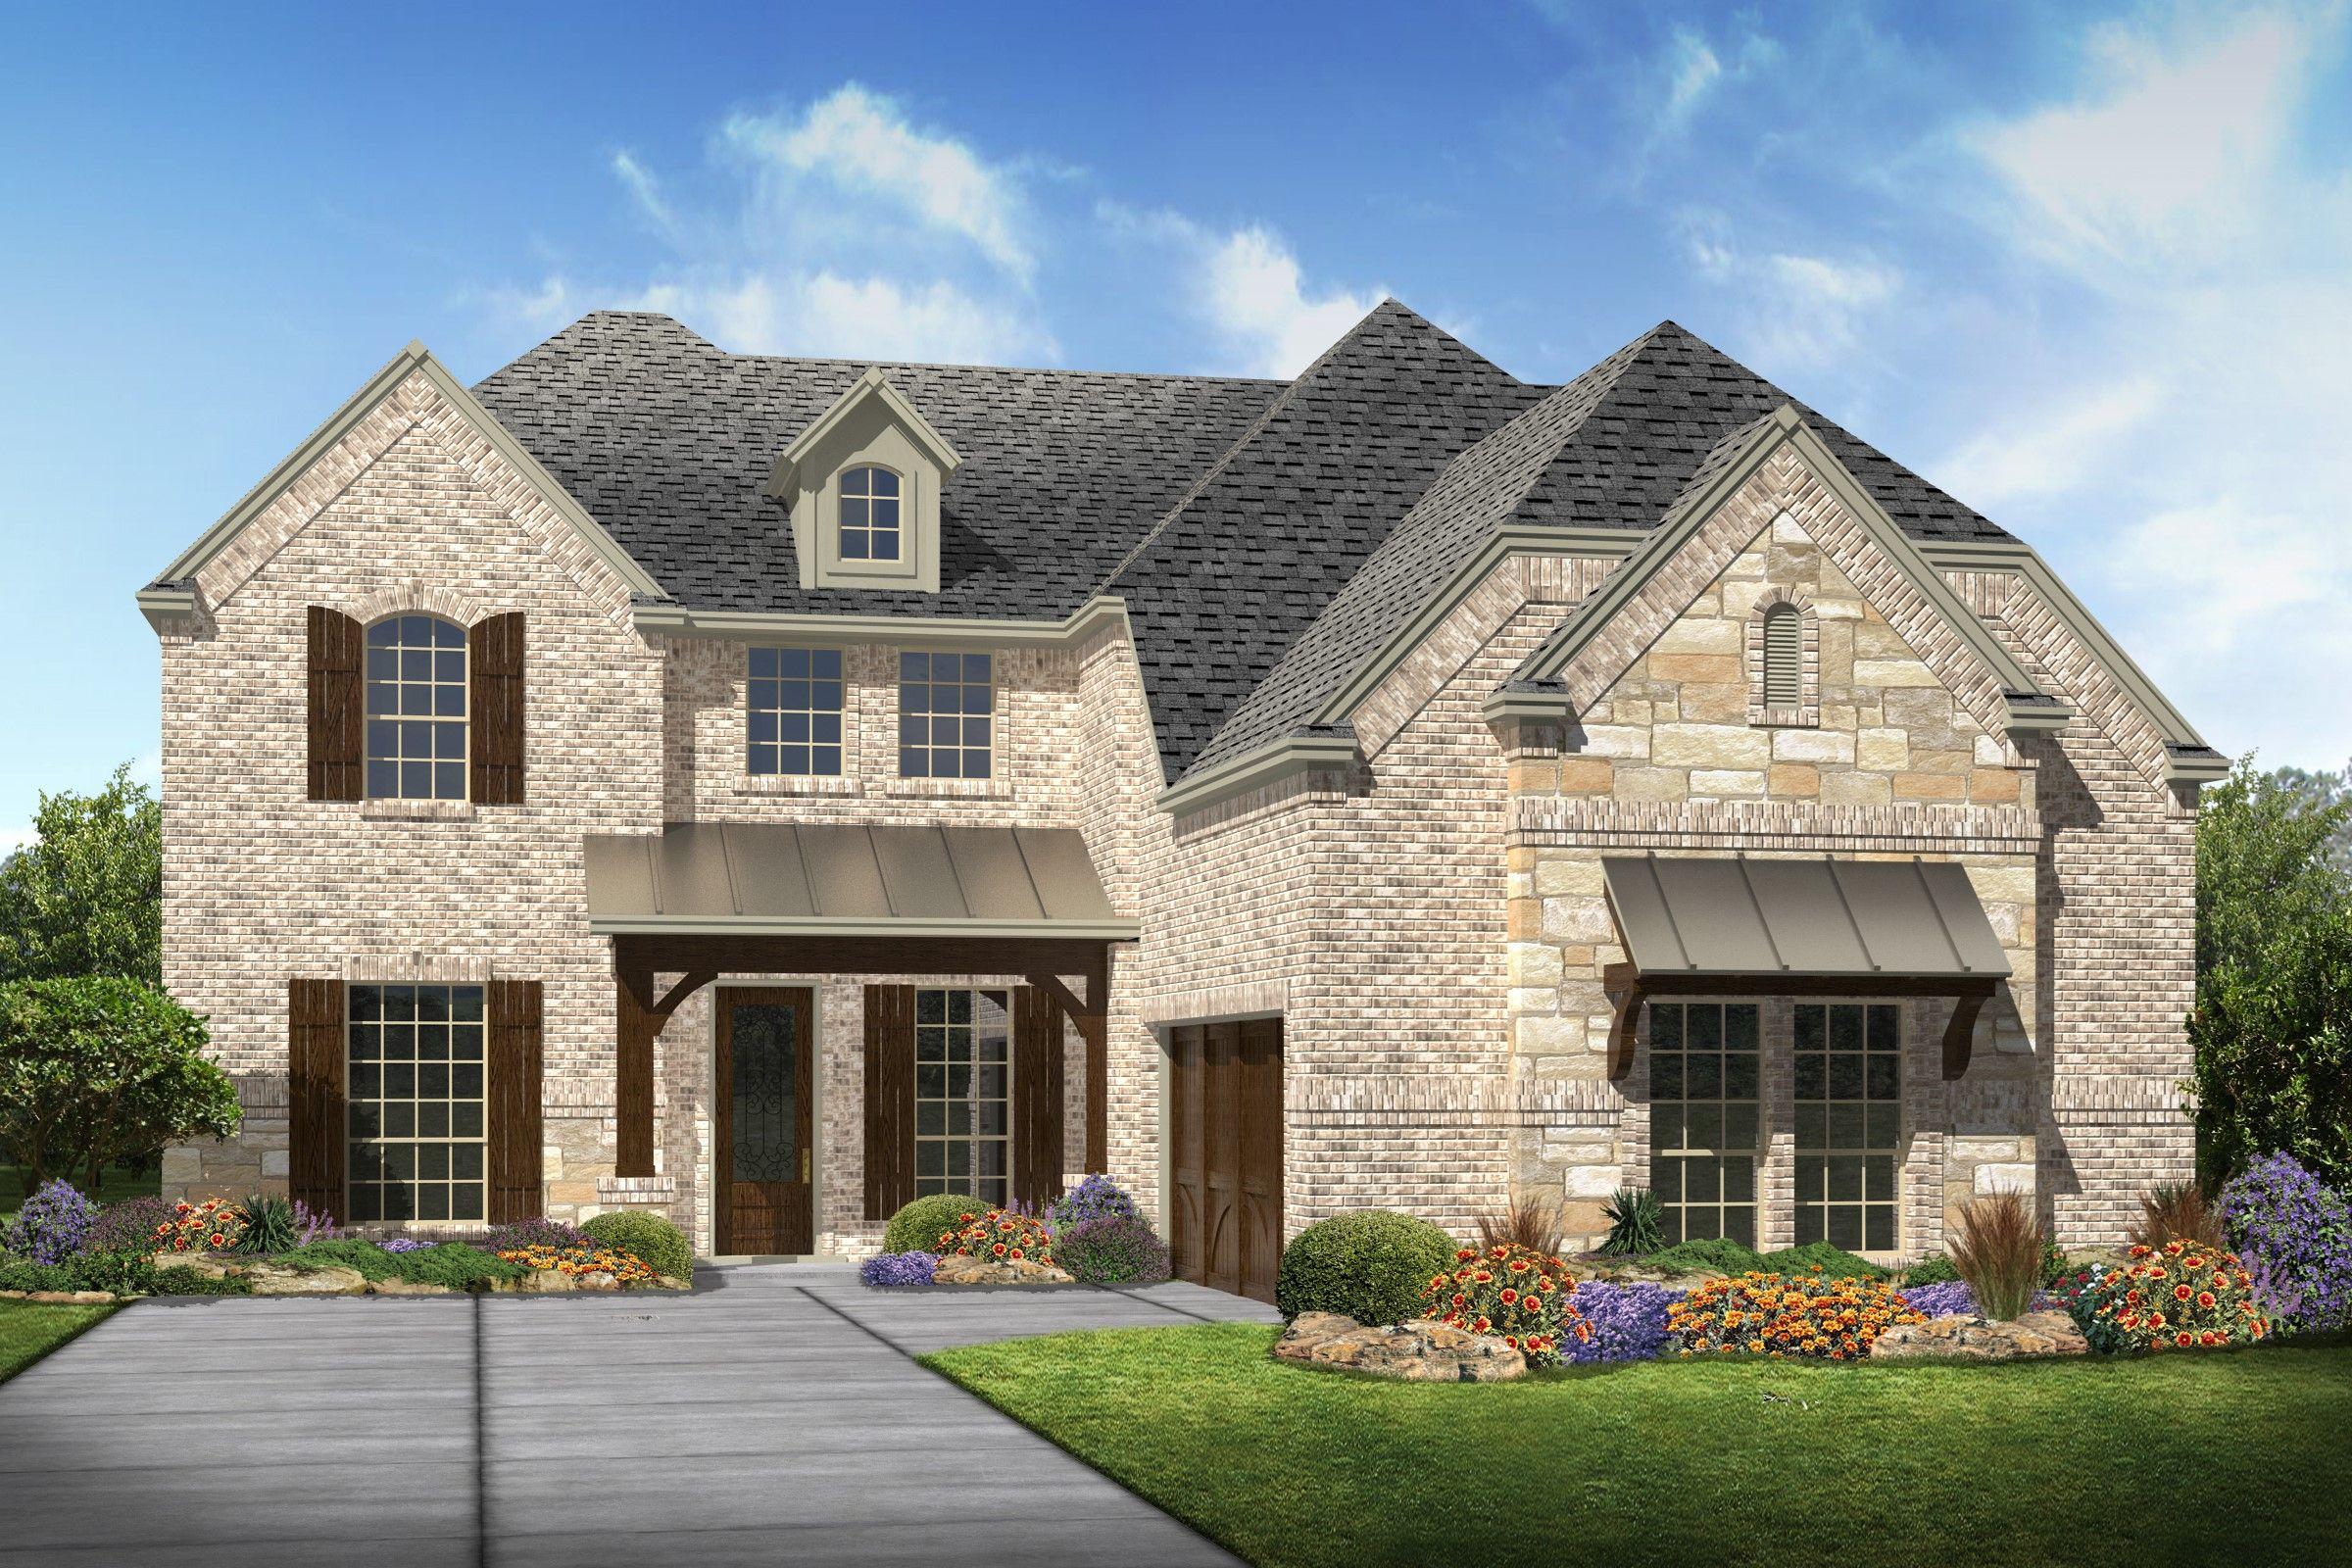 Single Family for Sale at Oakview Iii 1105 Prairie Ridge Lane Fort Worth, Texas 76115 United States